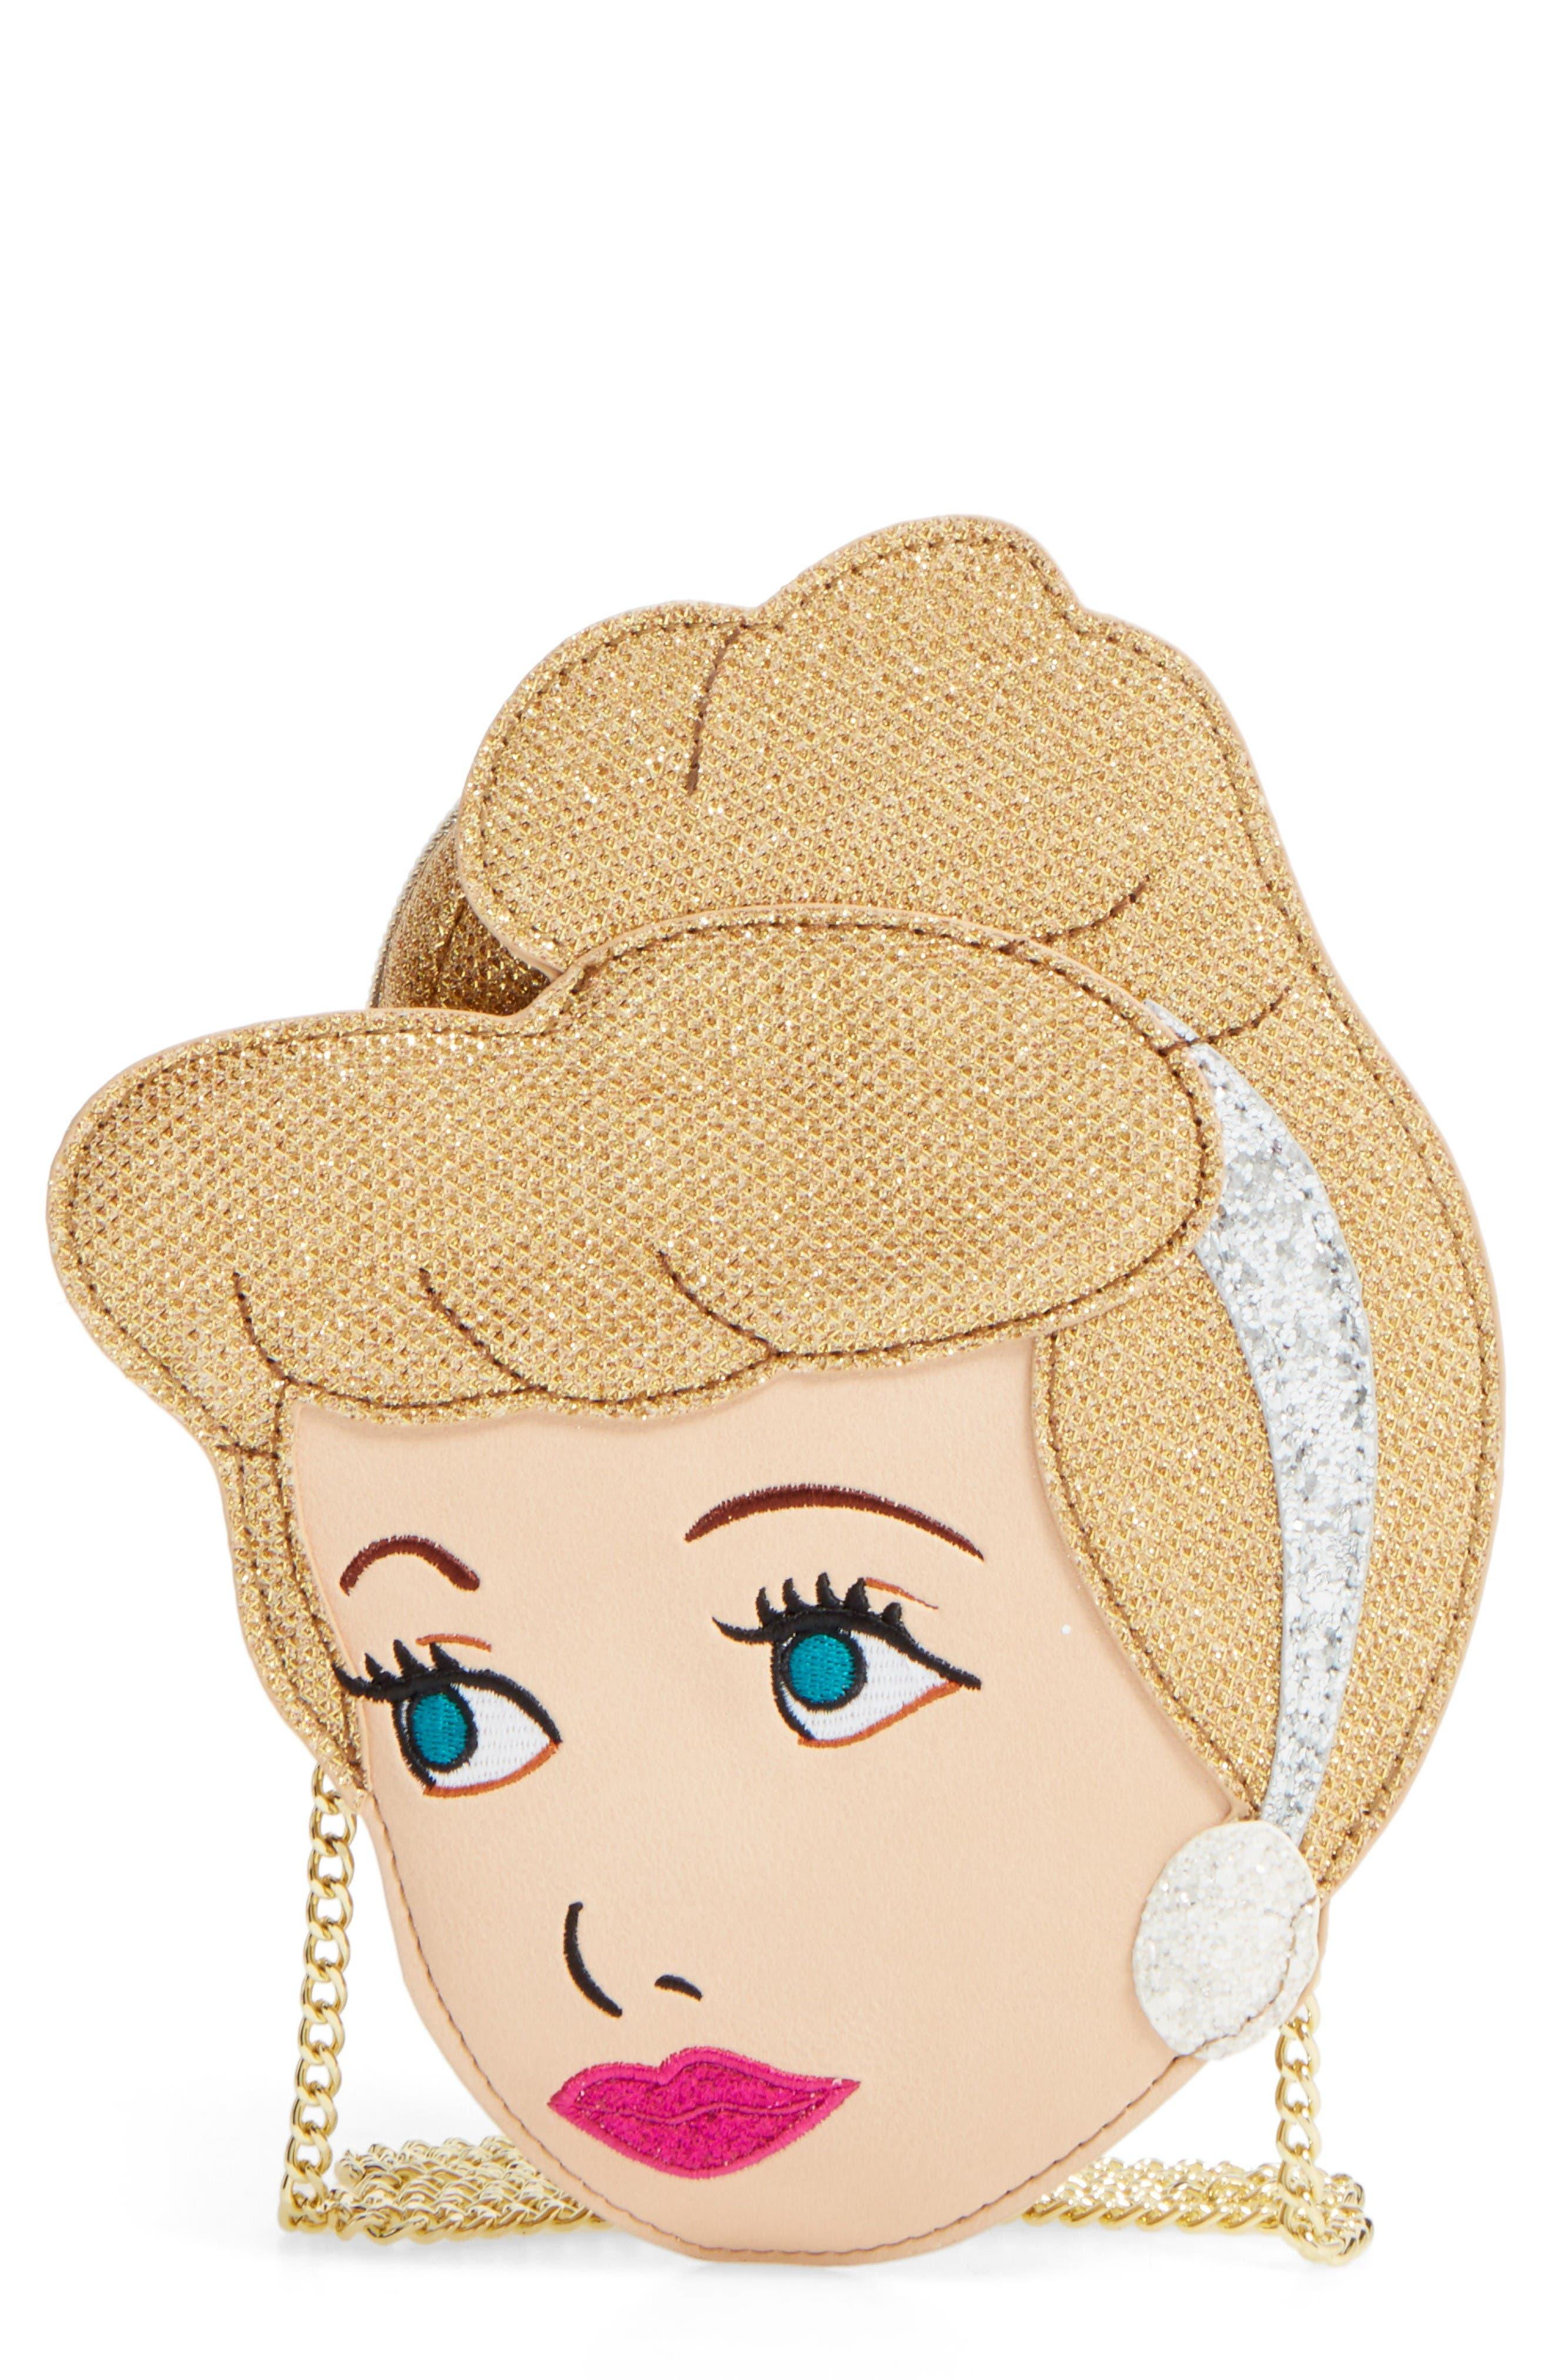 x Disney<sup>®</sup> Cinderella Crossbody Bag,                             Main thumbnail 1, color,                             Beige